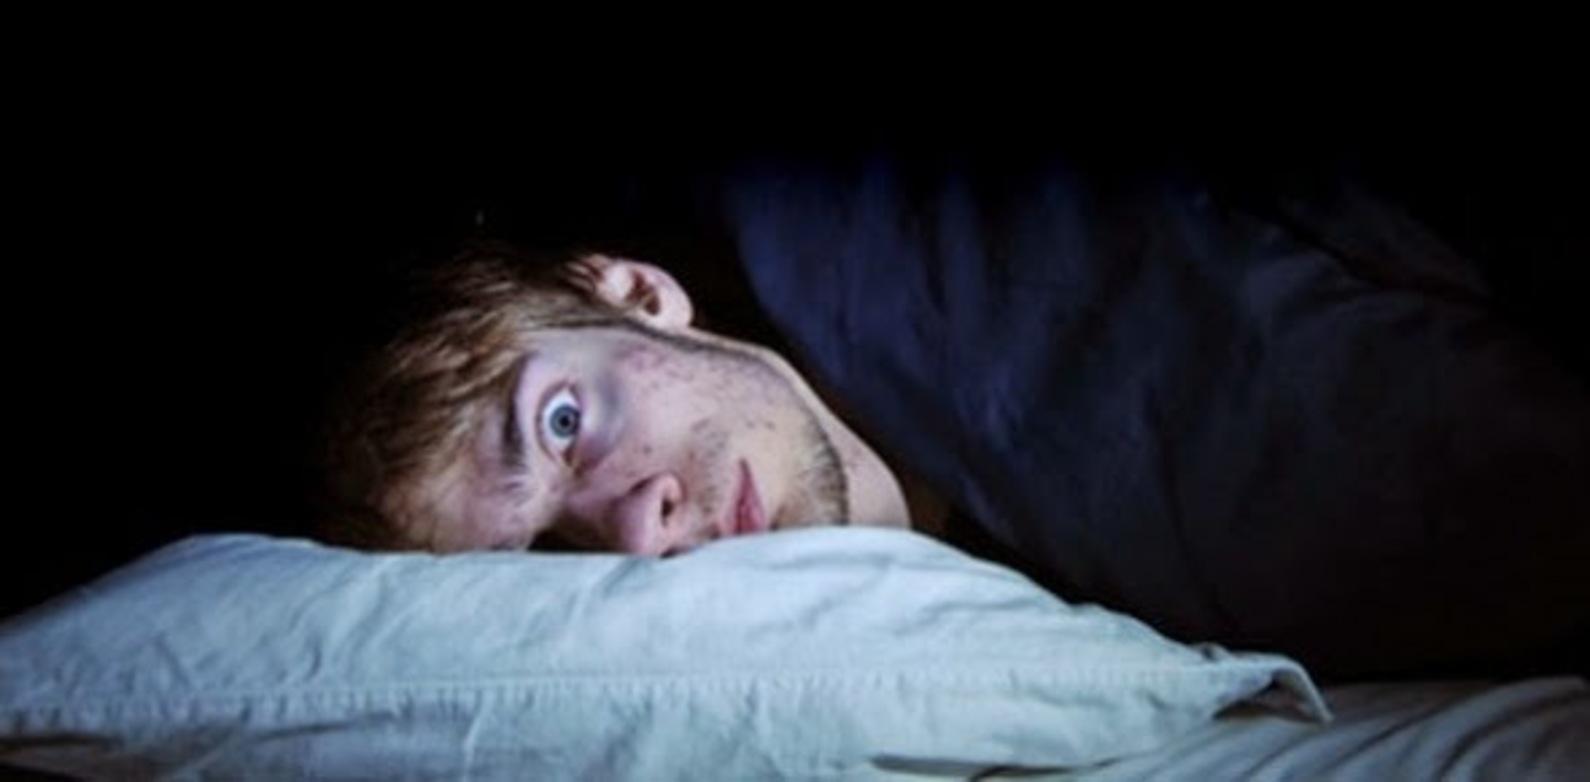 Fobias extrañas en personas comunes